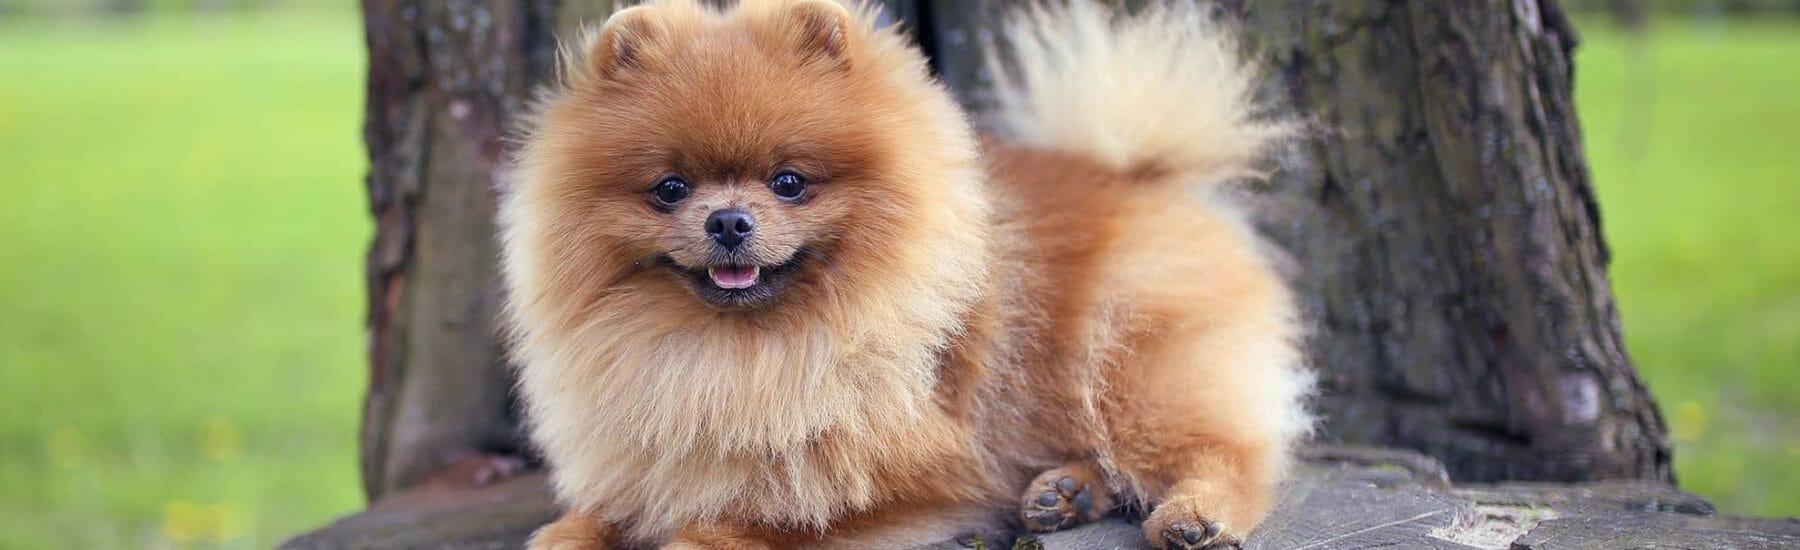 Small fluffy dog looking towards camera